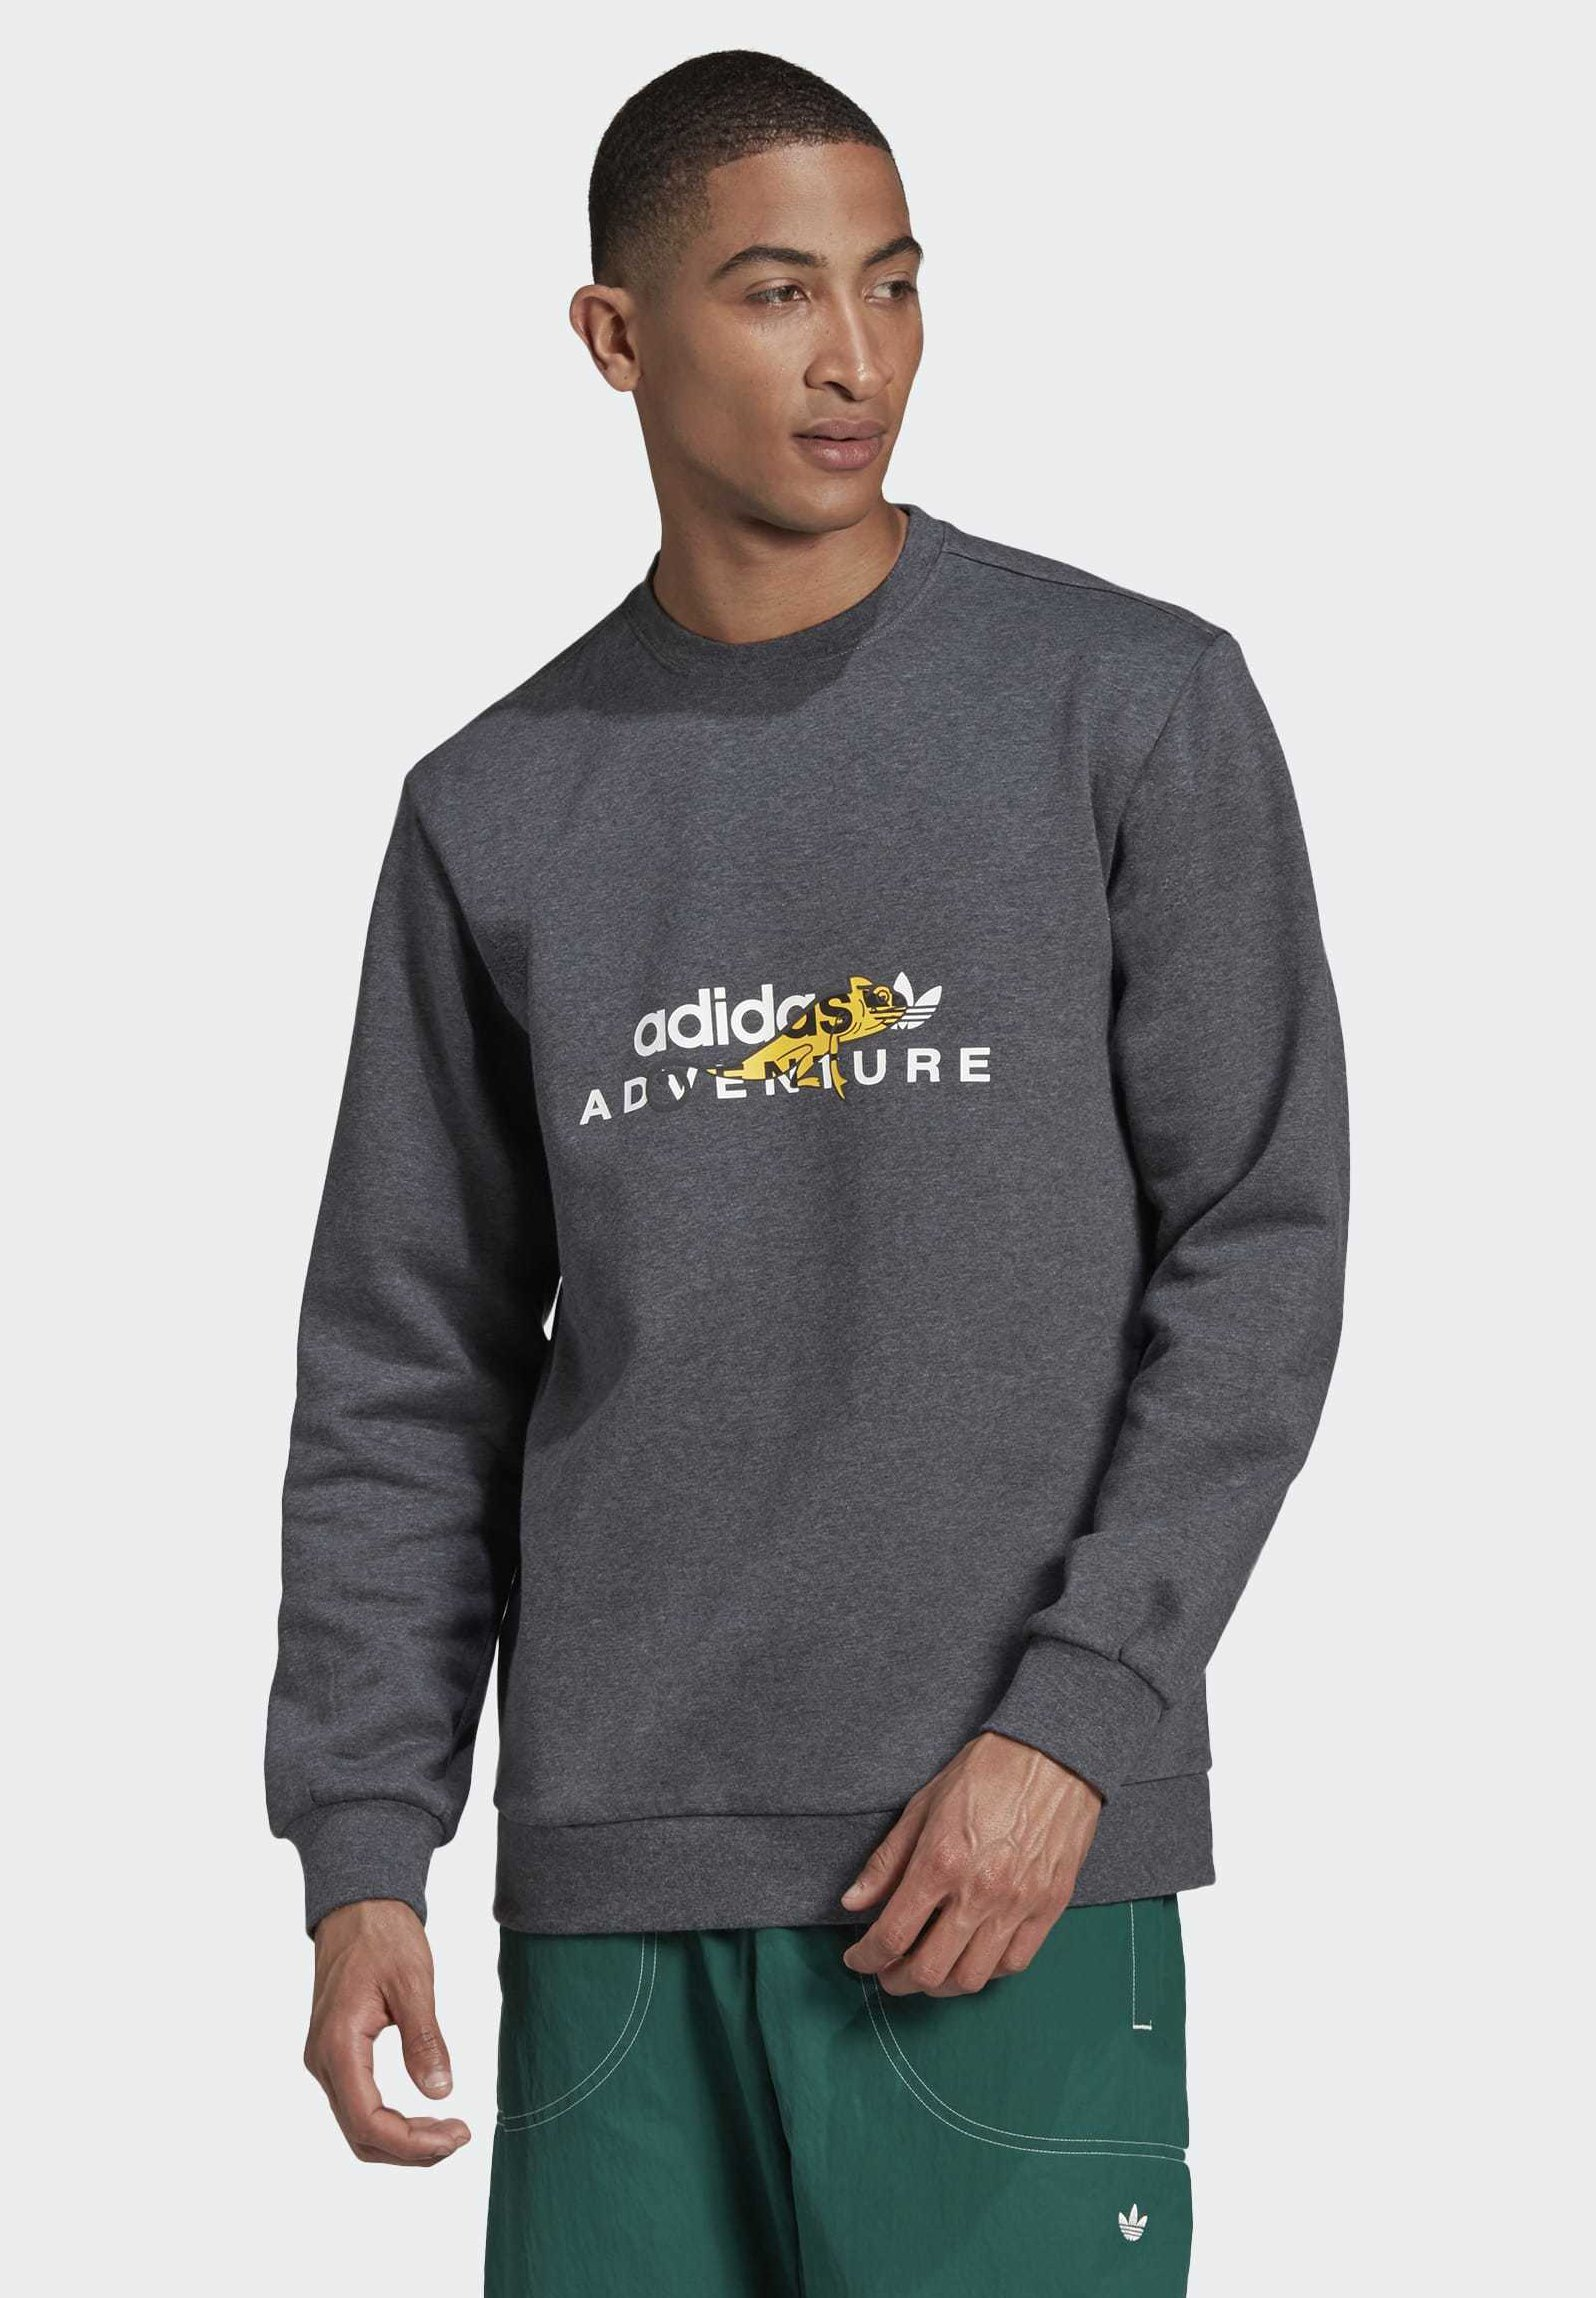 adidas Originals ADVENTURE CREWNECK SWEATSHIRT Sweatshirt